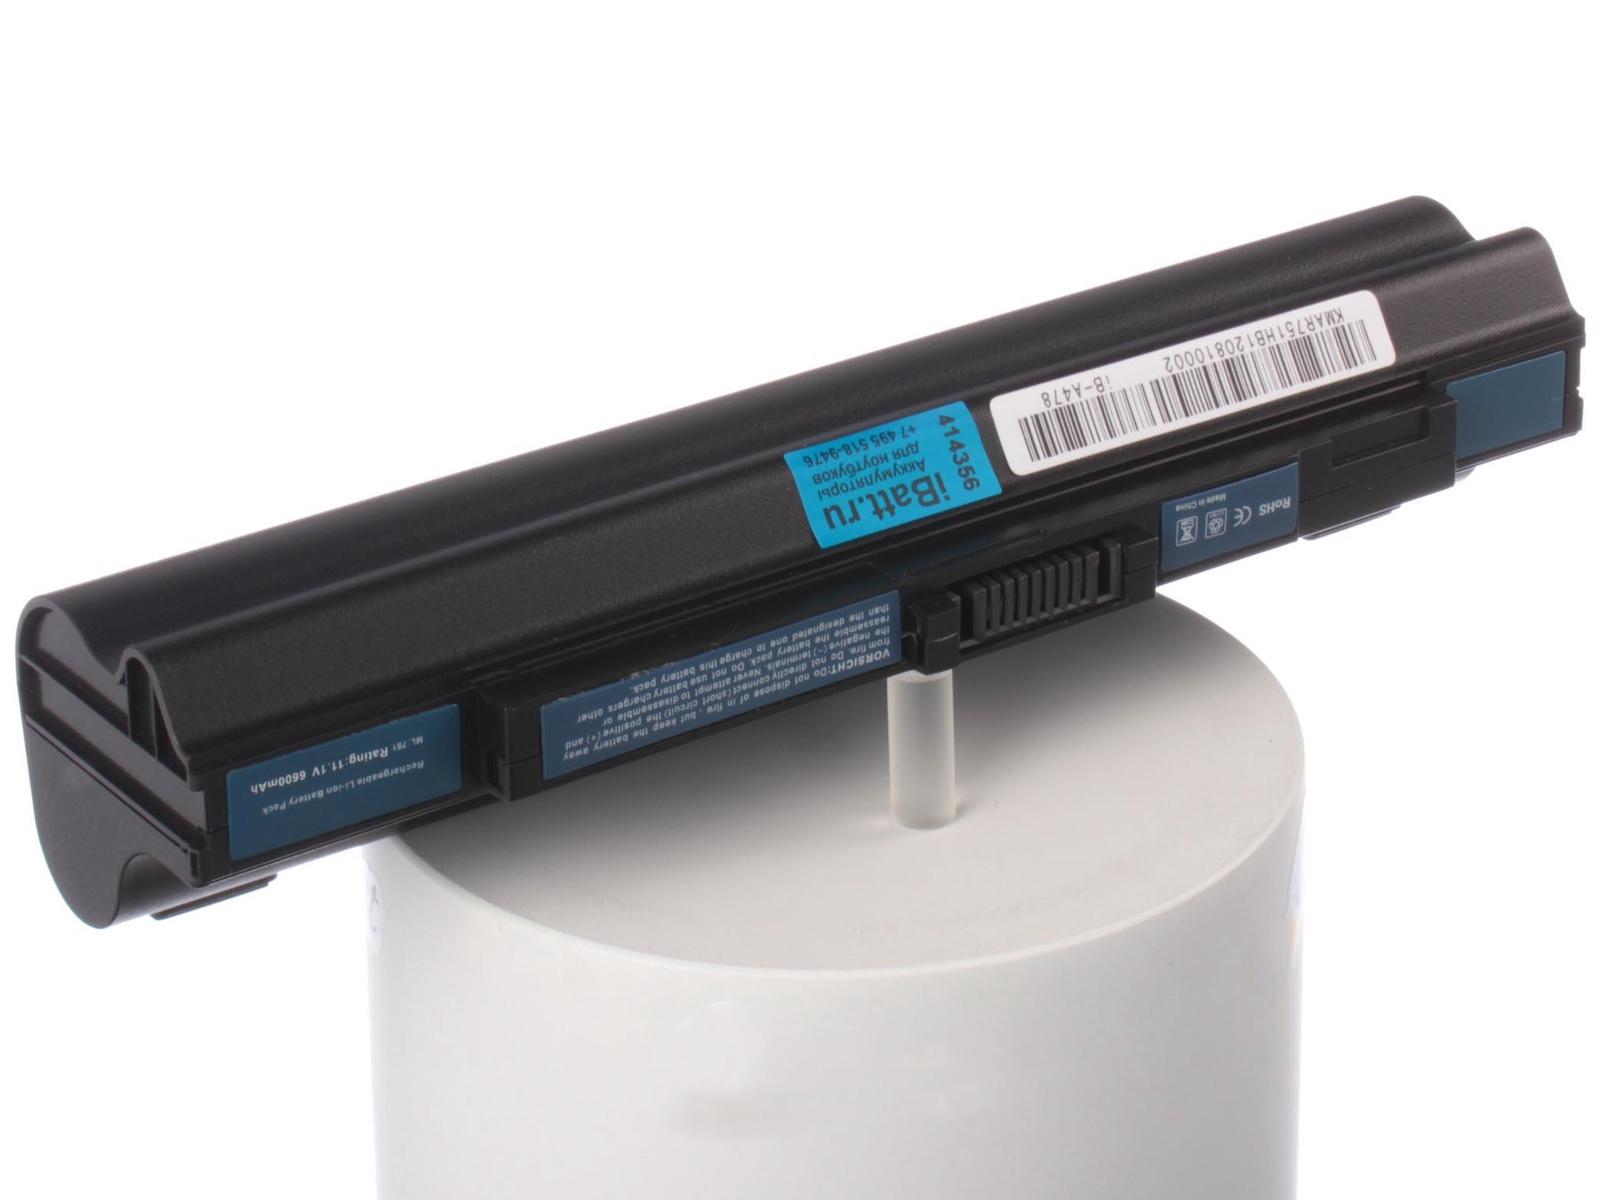 Аккумулятор для ноутбука iBatt для Acer Aspire One ZG8, Aspire One ZA3, Aspire One 751h, Aspire One 751, Aspire One 531h, Aspire One Pro AOP531h, для Gateway LT3113, для Acer Aspire One AO531h, Aspire One AO531h-0Bk